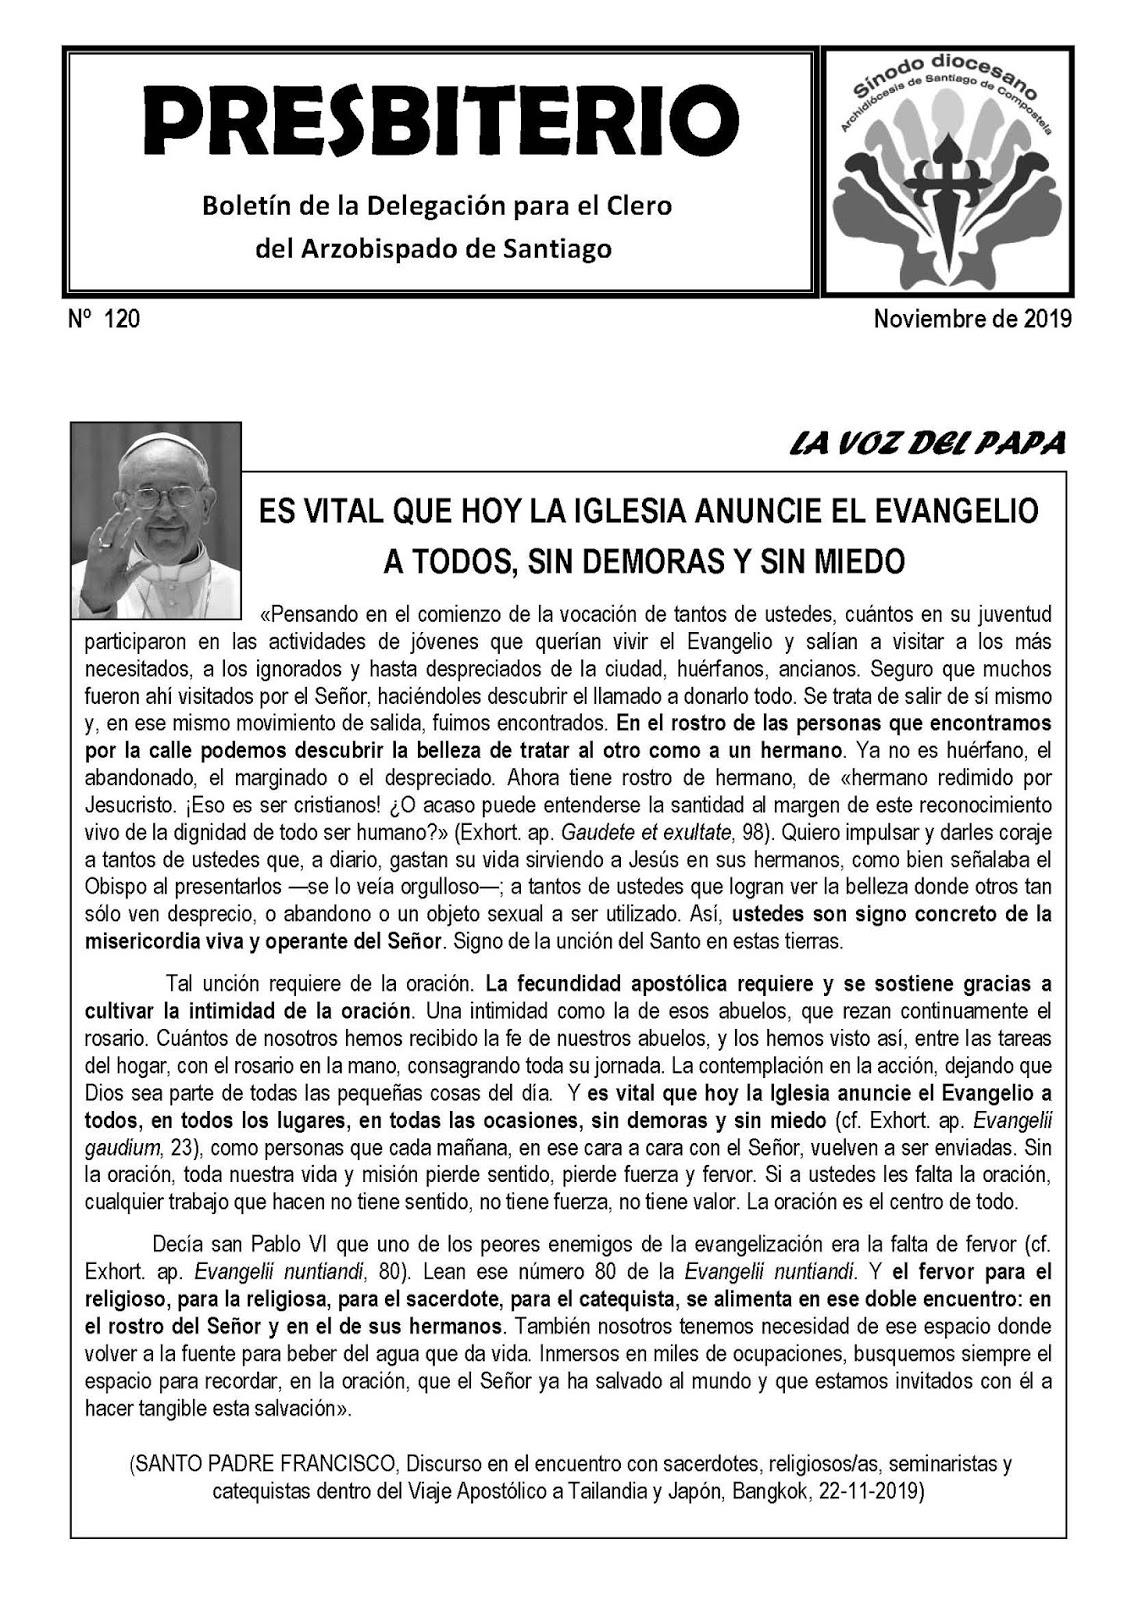 https://www.dropbox.com/s/c1qngenrzsu5qrg/Presbiterio_120.pdf?dl=0